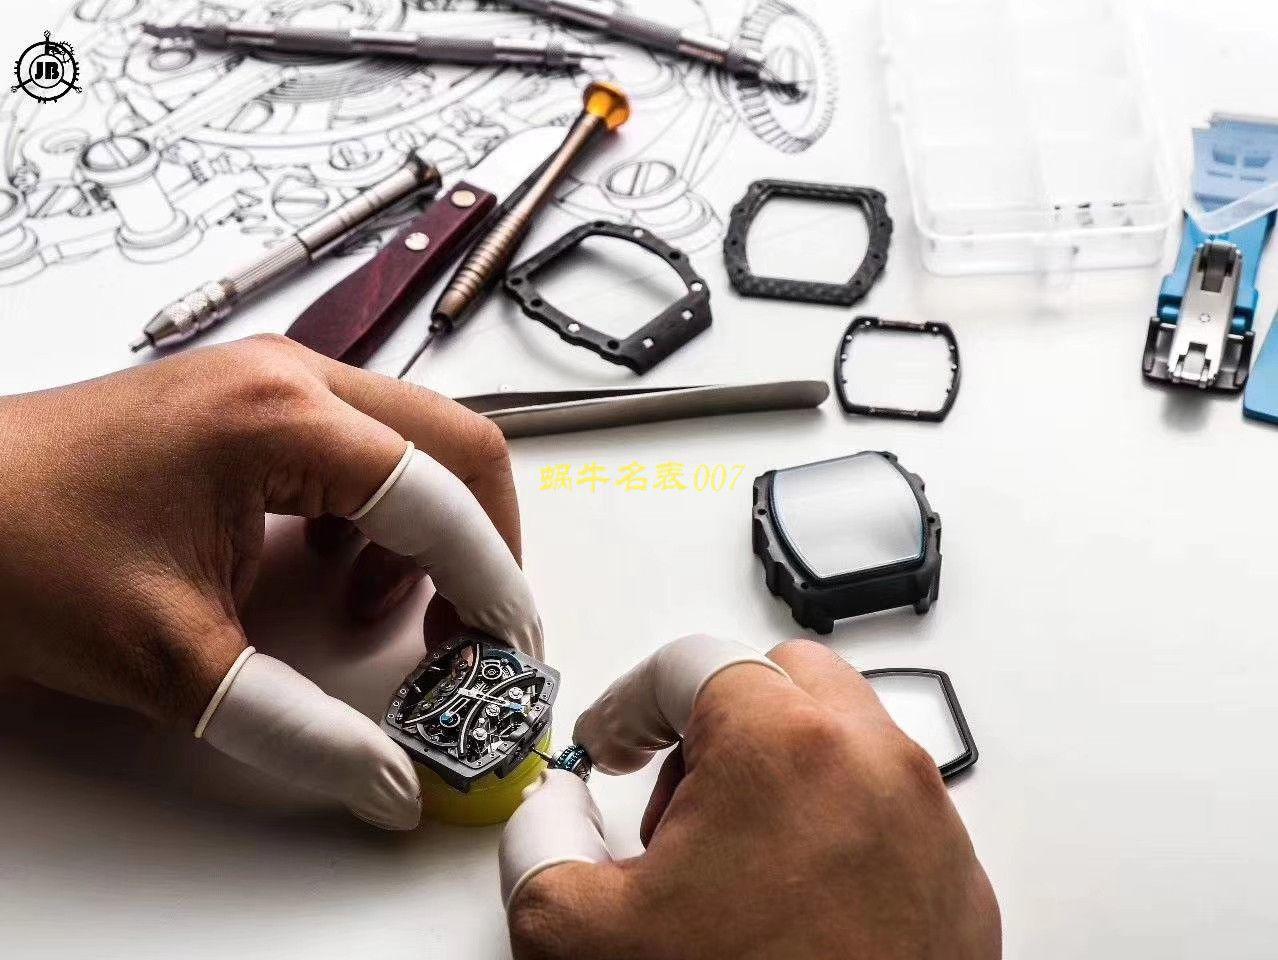 【JB厂理查德米勒复刻手表】Richard Mille男士系列RM 53-01 PABLO MAC DONOUGH陀飞轮腕表 / RM 53-01